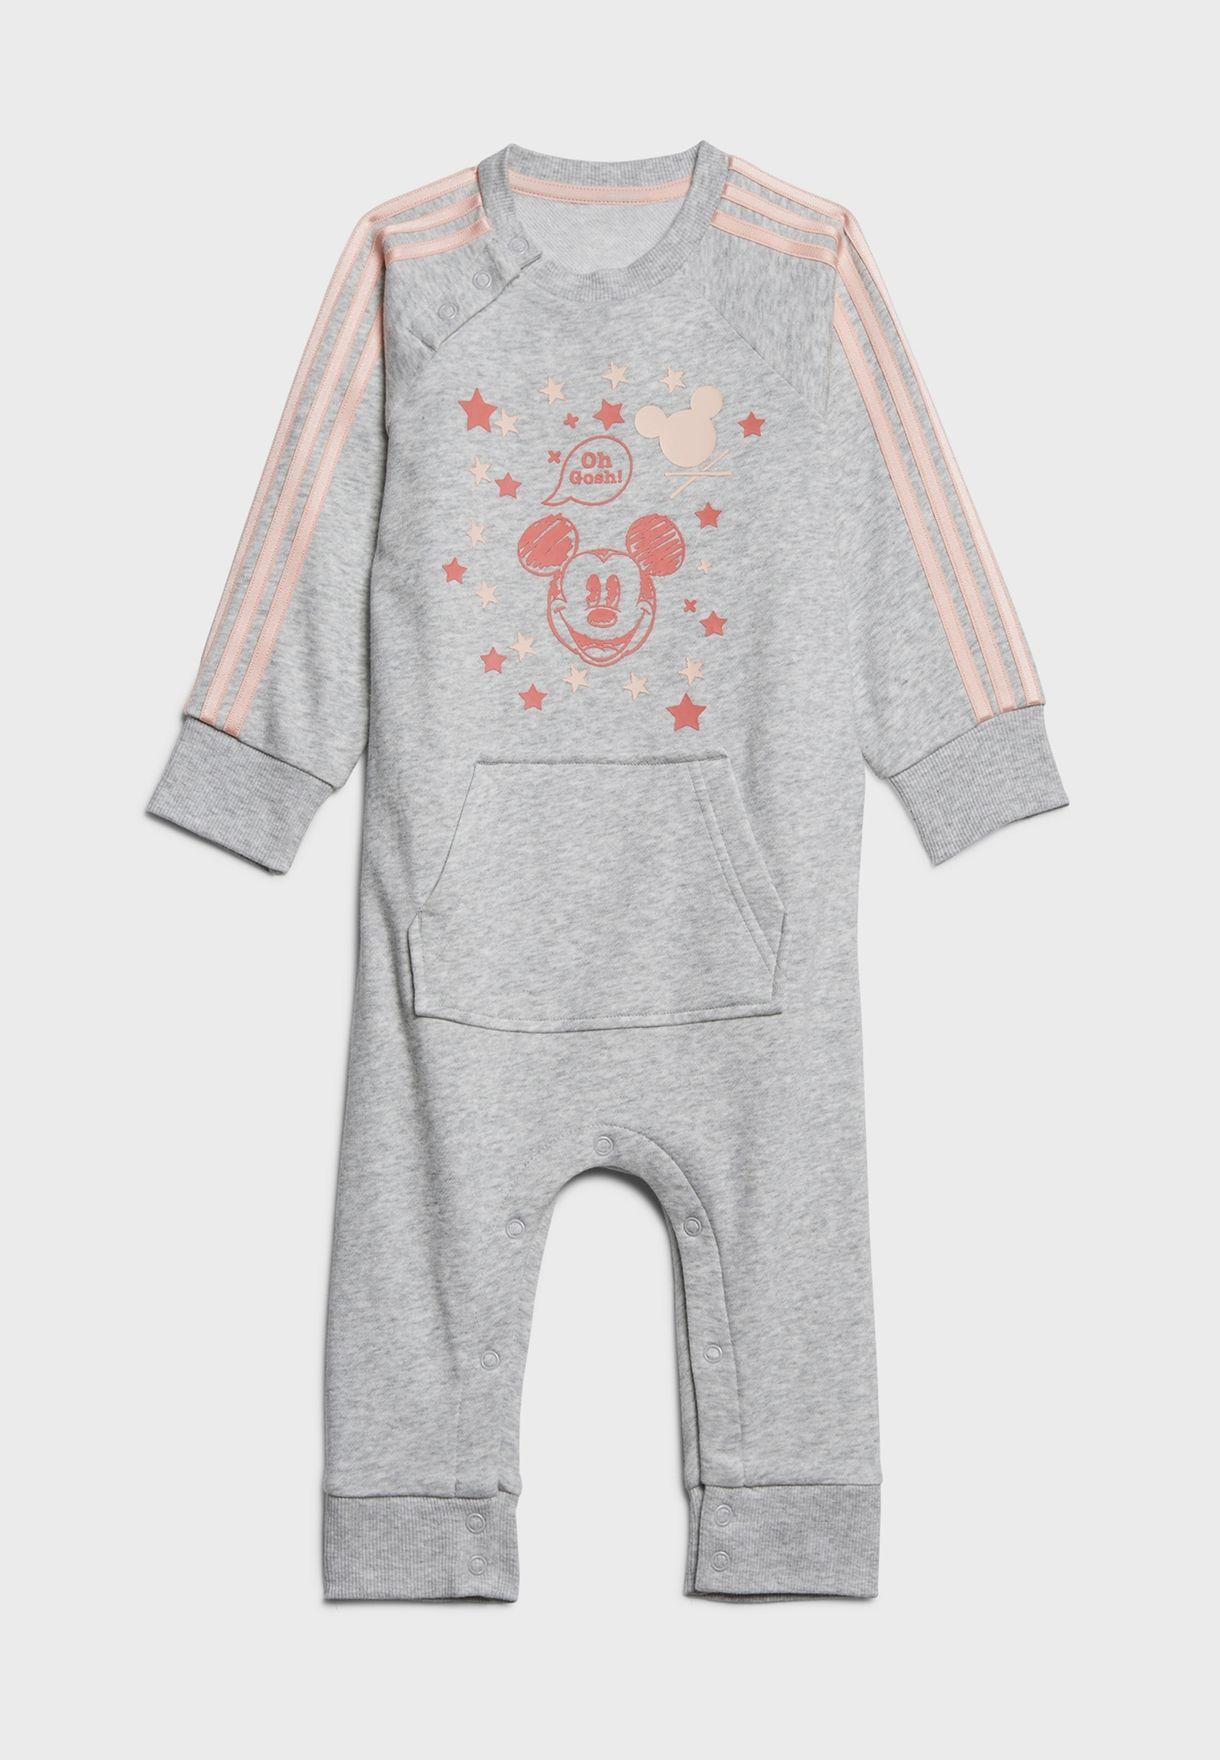 Infant Minimal Romper